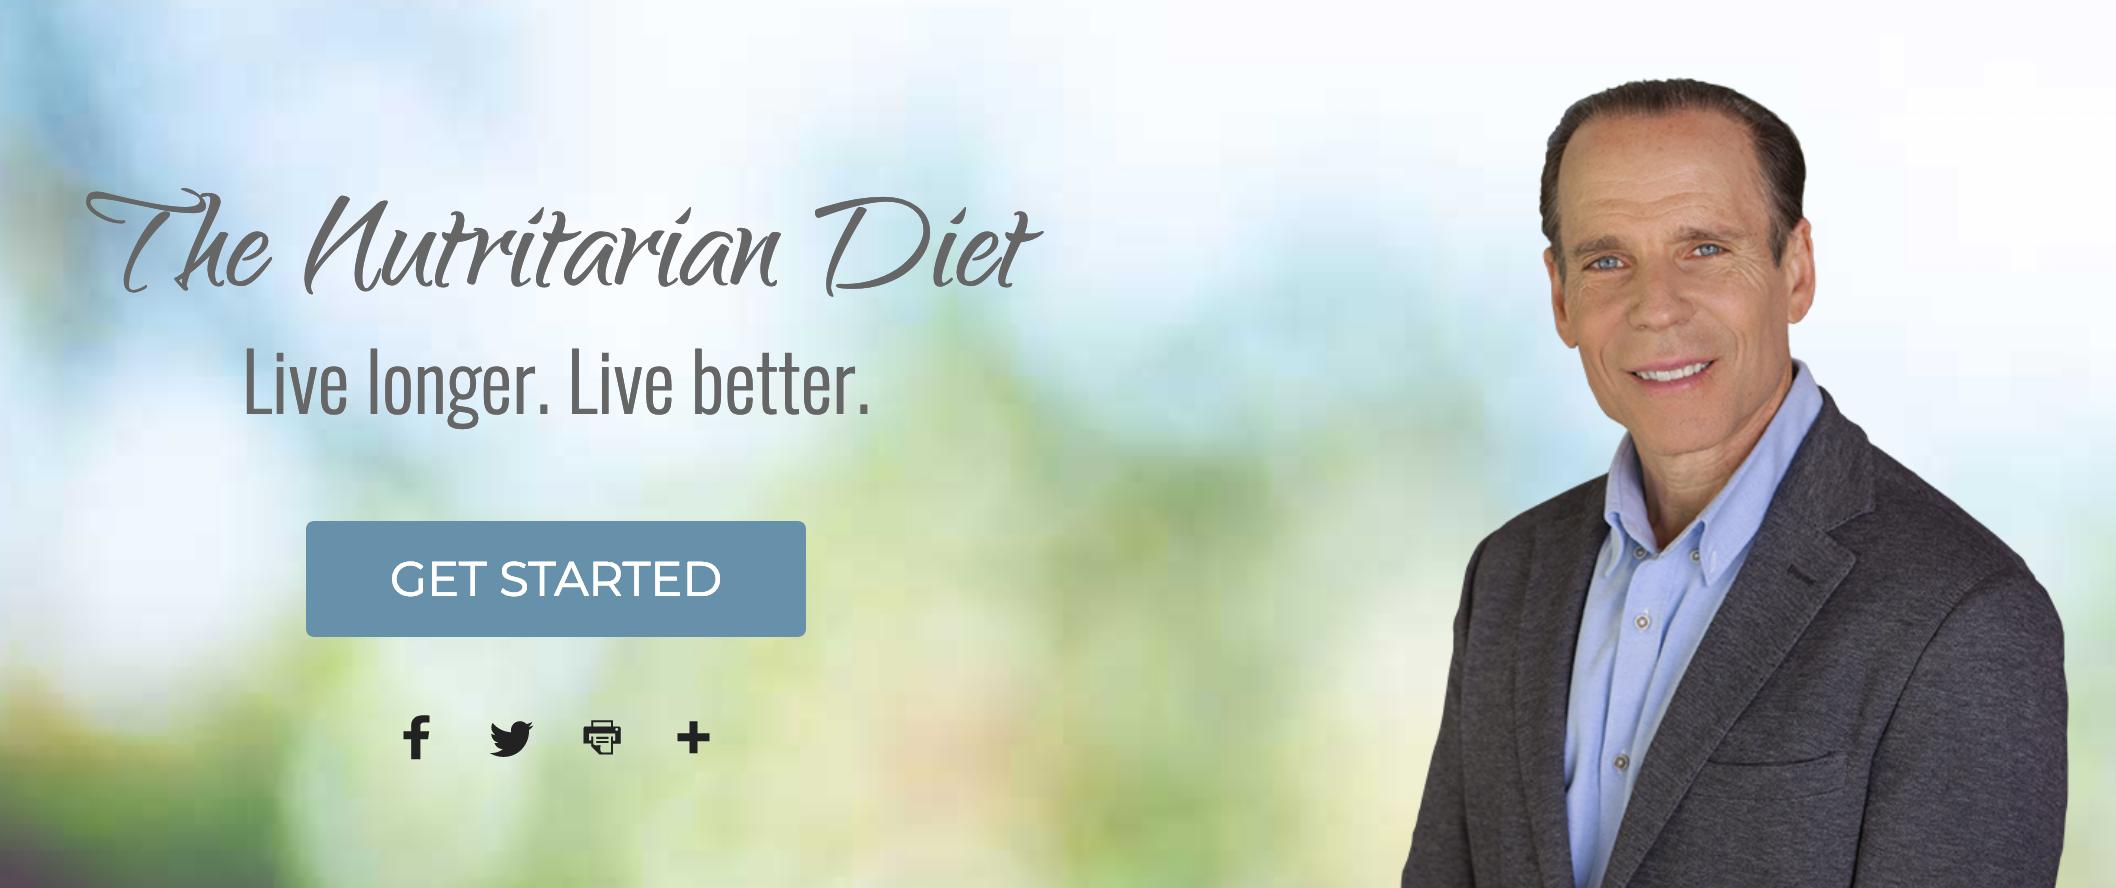 Dr Fuhrman Diet Plan